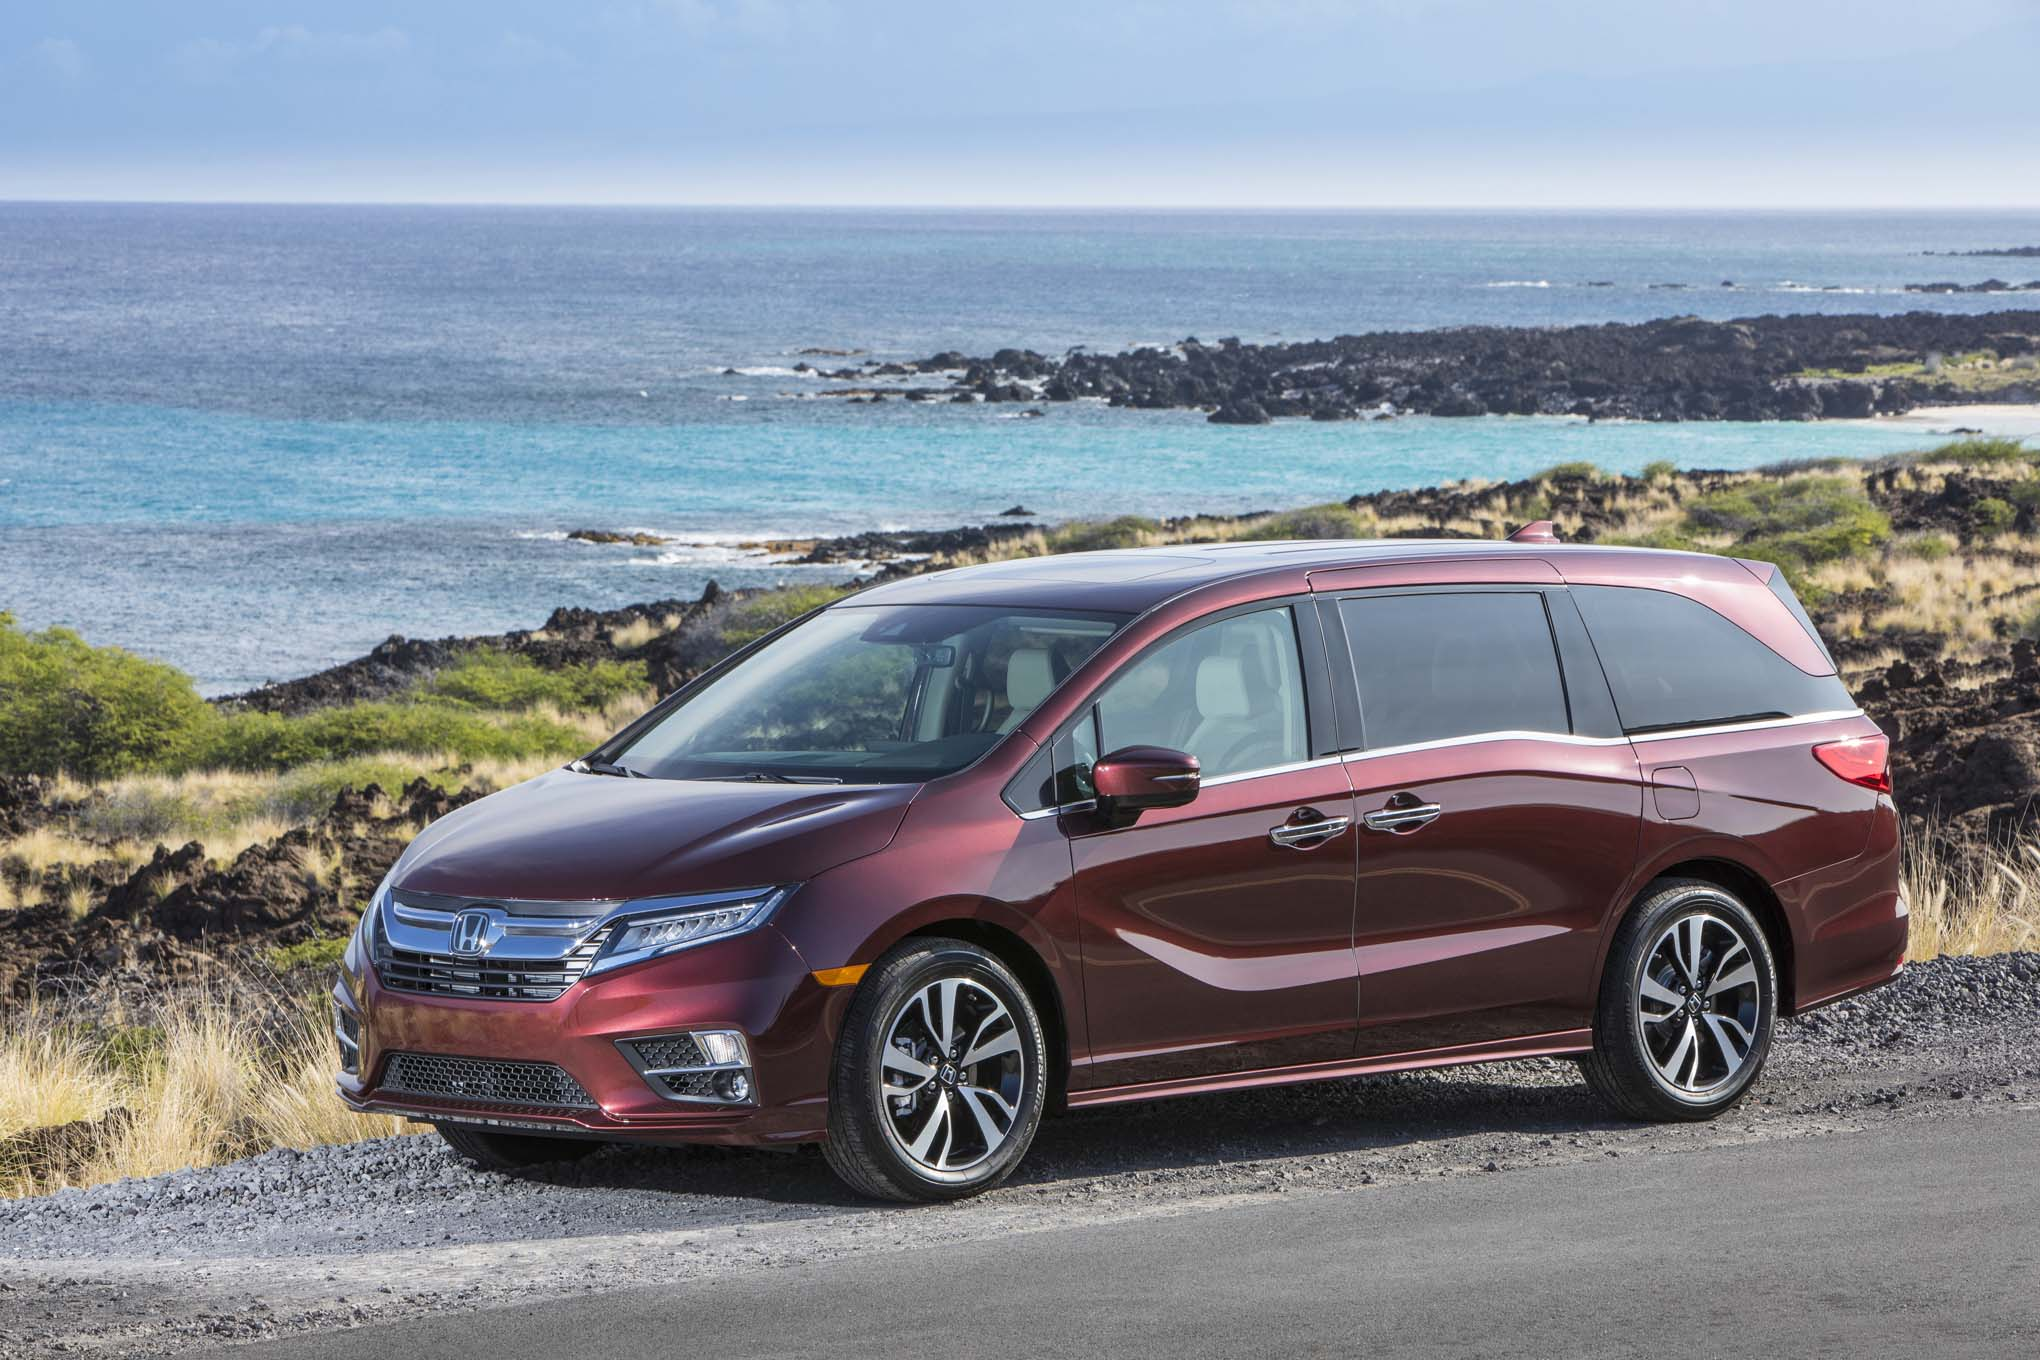 2018 Honda Odyssey Front Three Quarter 08